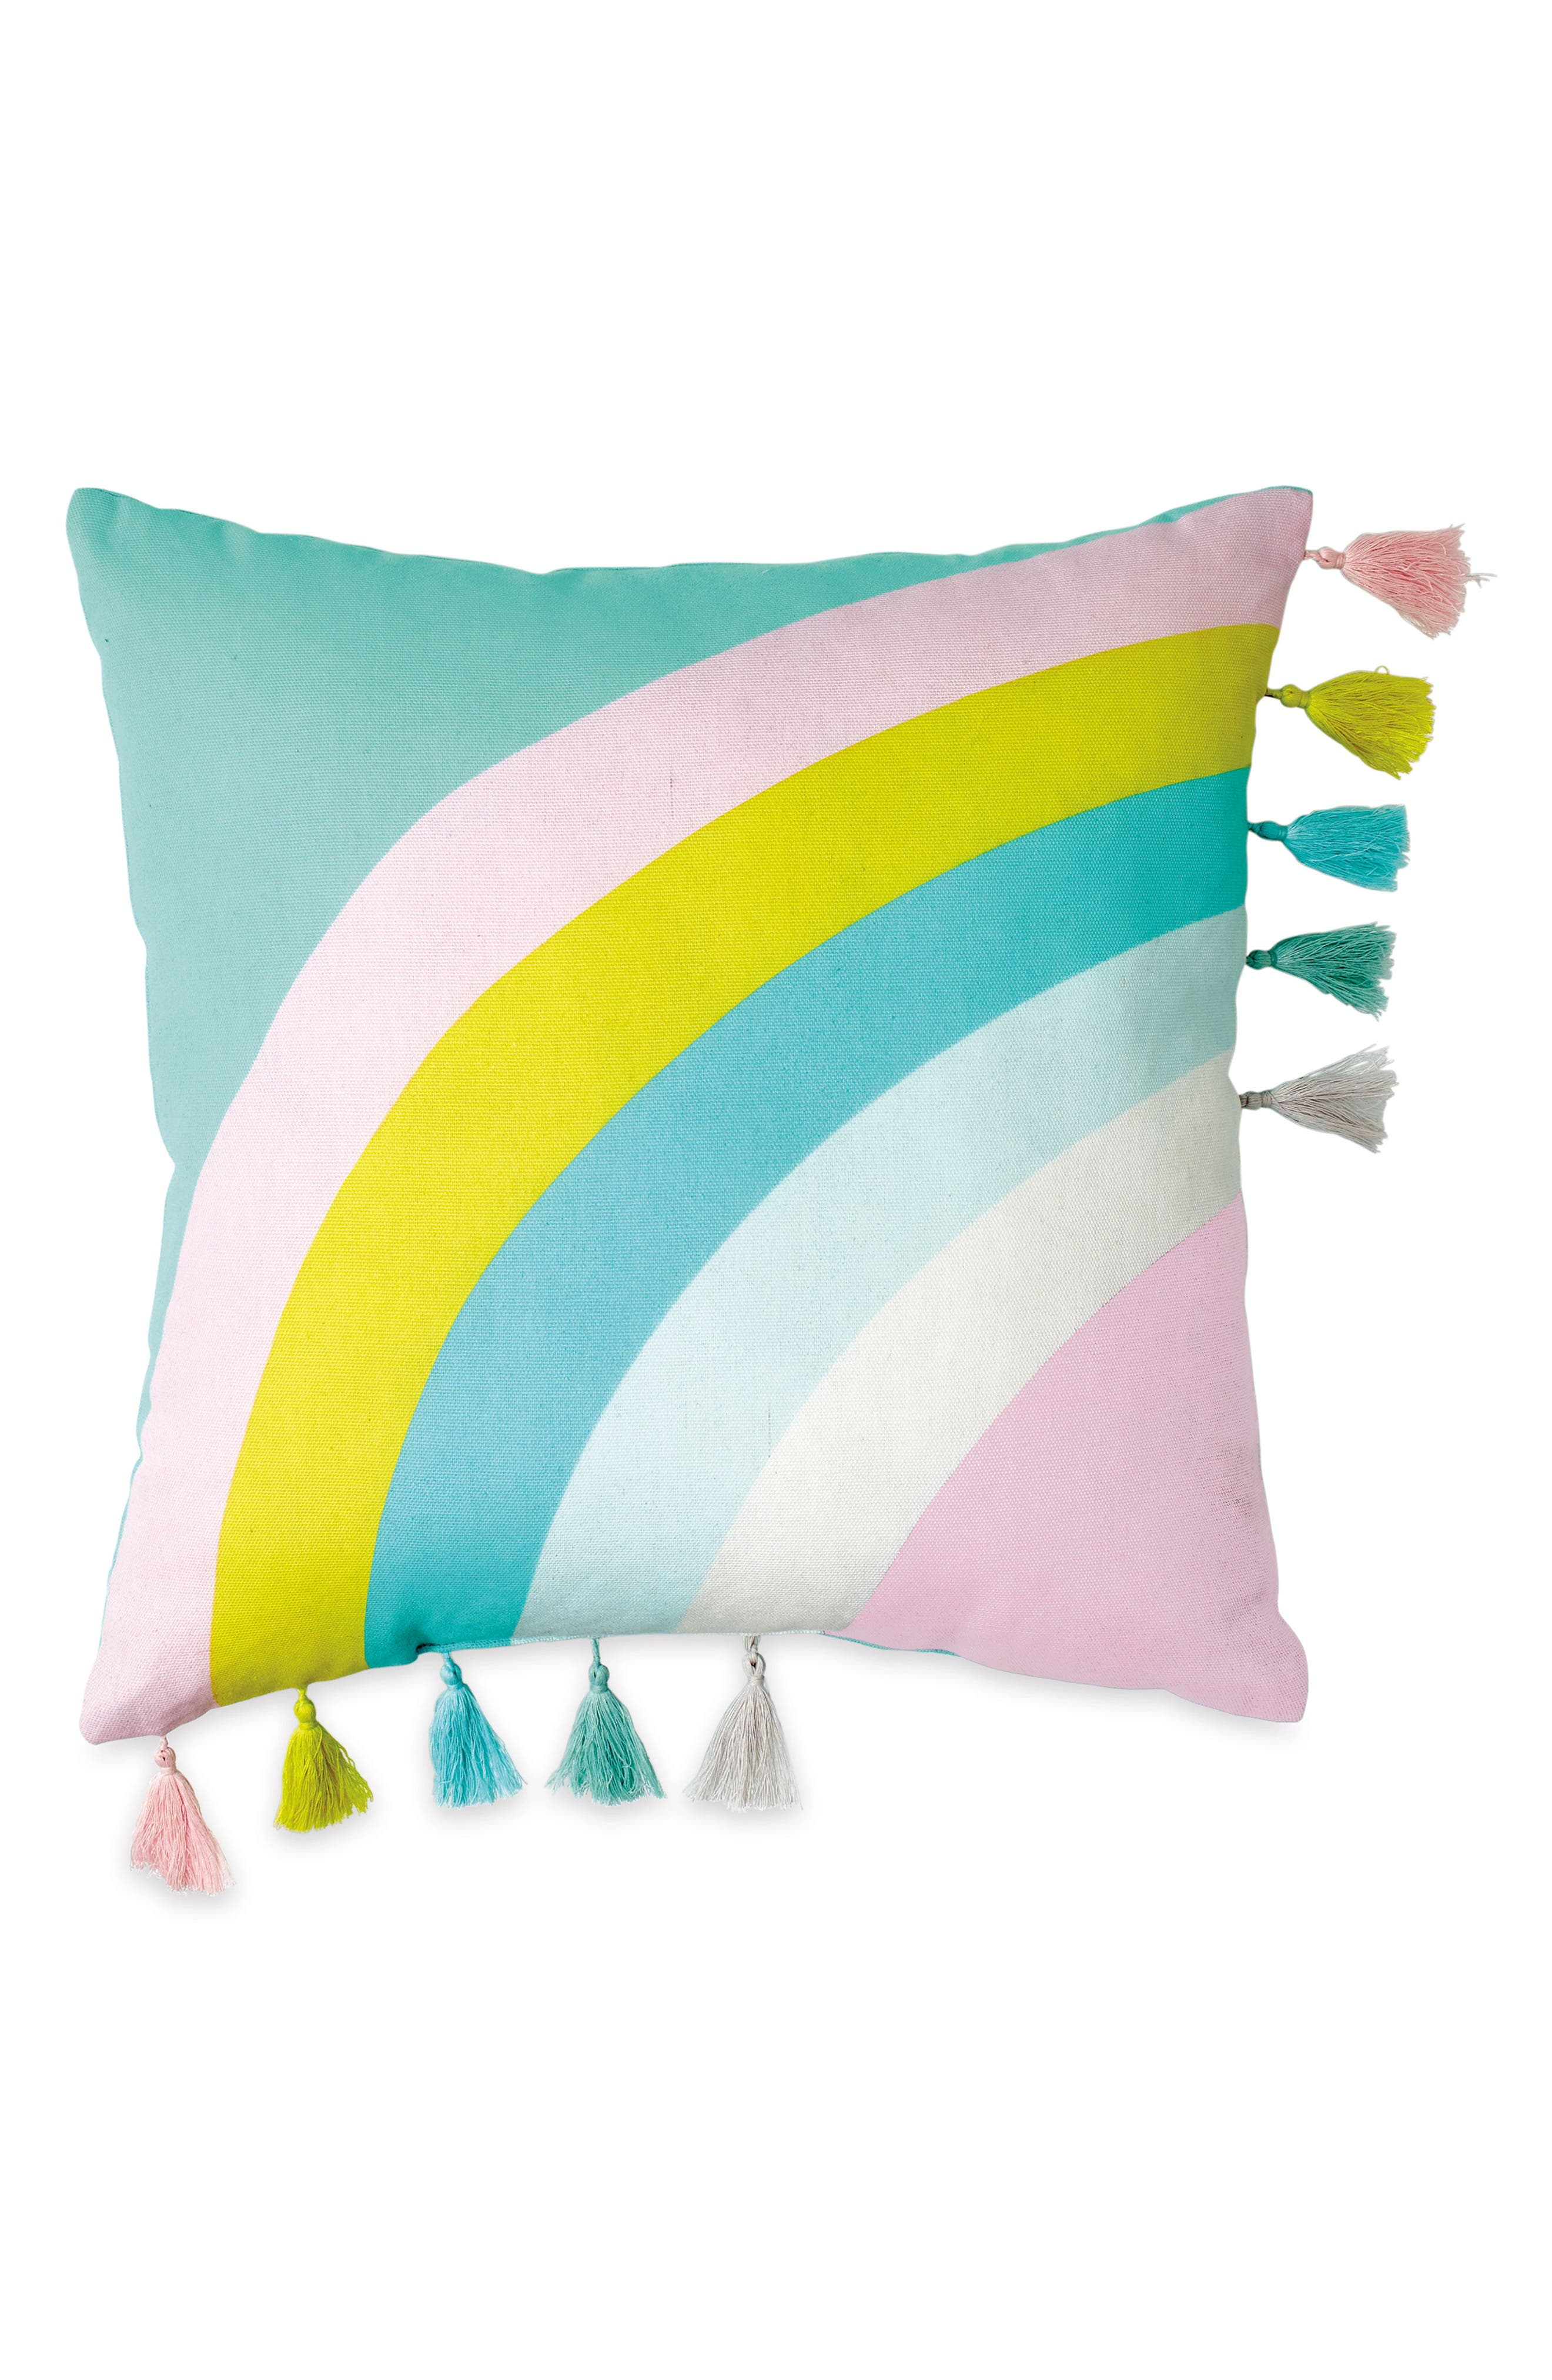 DKNY, Over the Moon Comforter, Sham & Accent Pillow Set, Alternate thumbnail 4, color, PURPLE